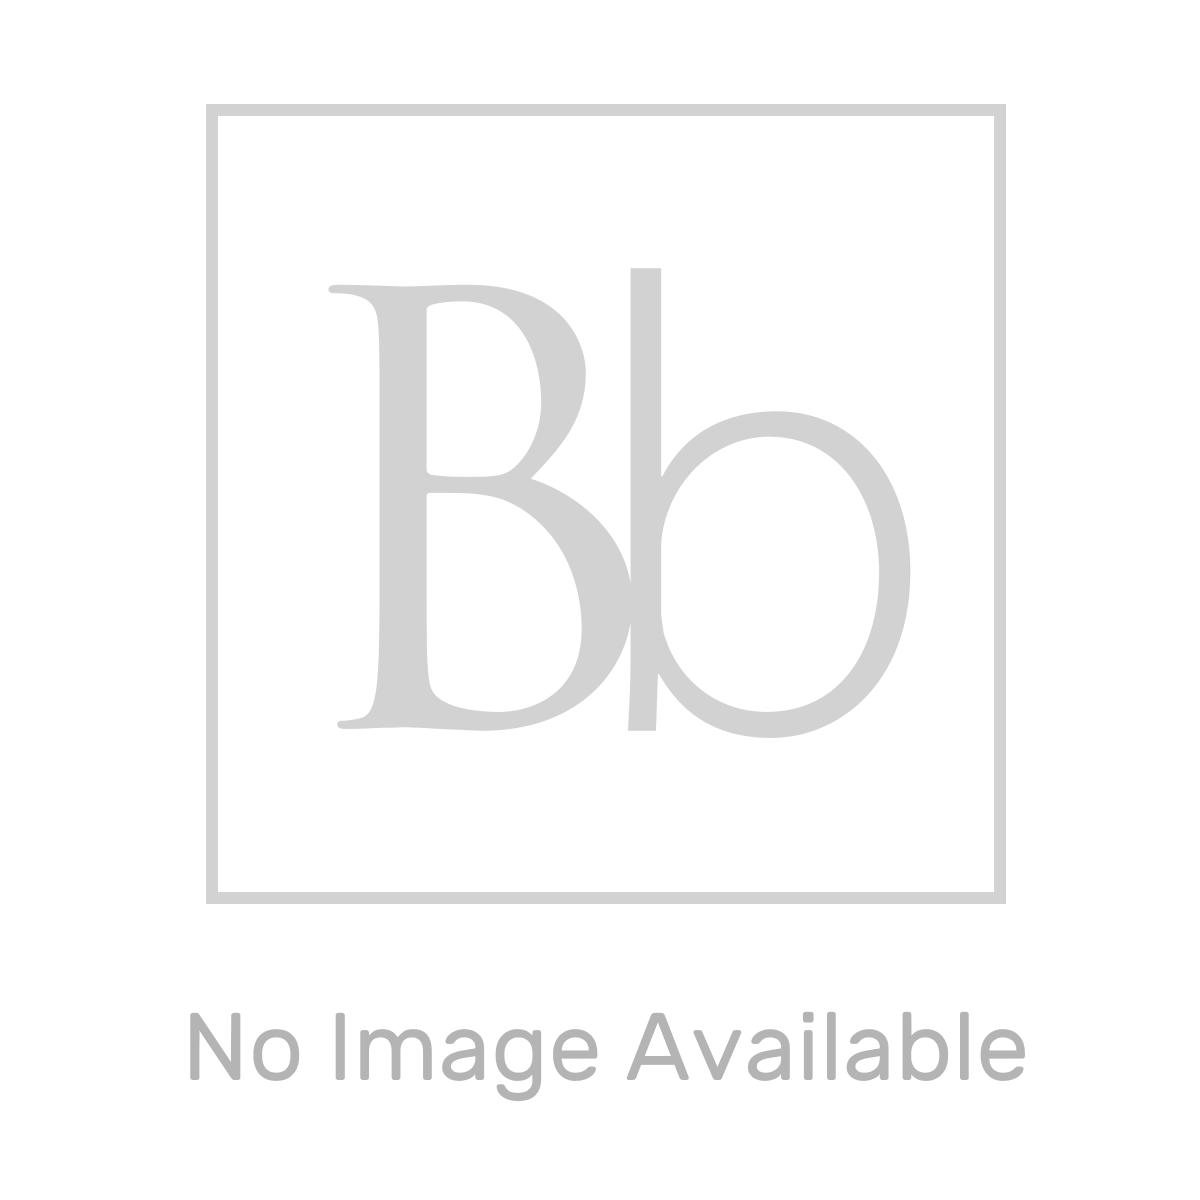 Wetwall Gloss Black Shower Panel